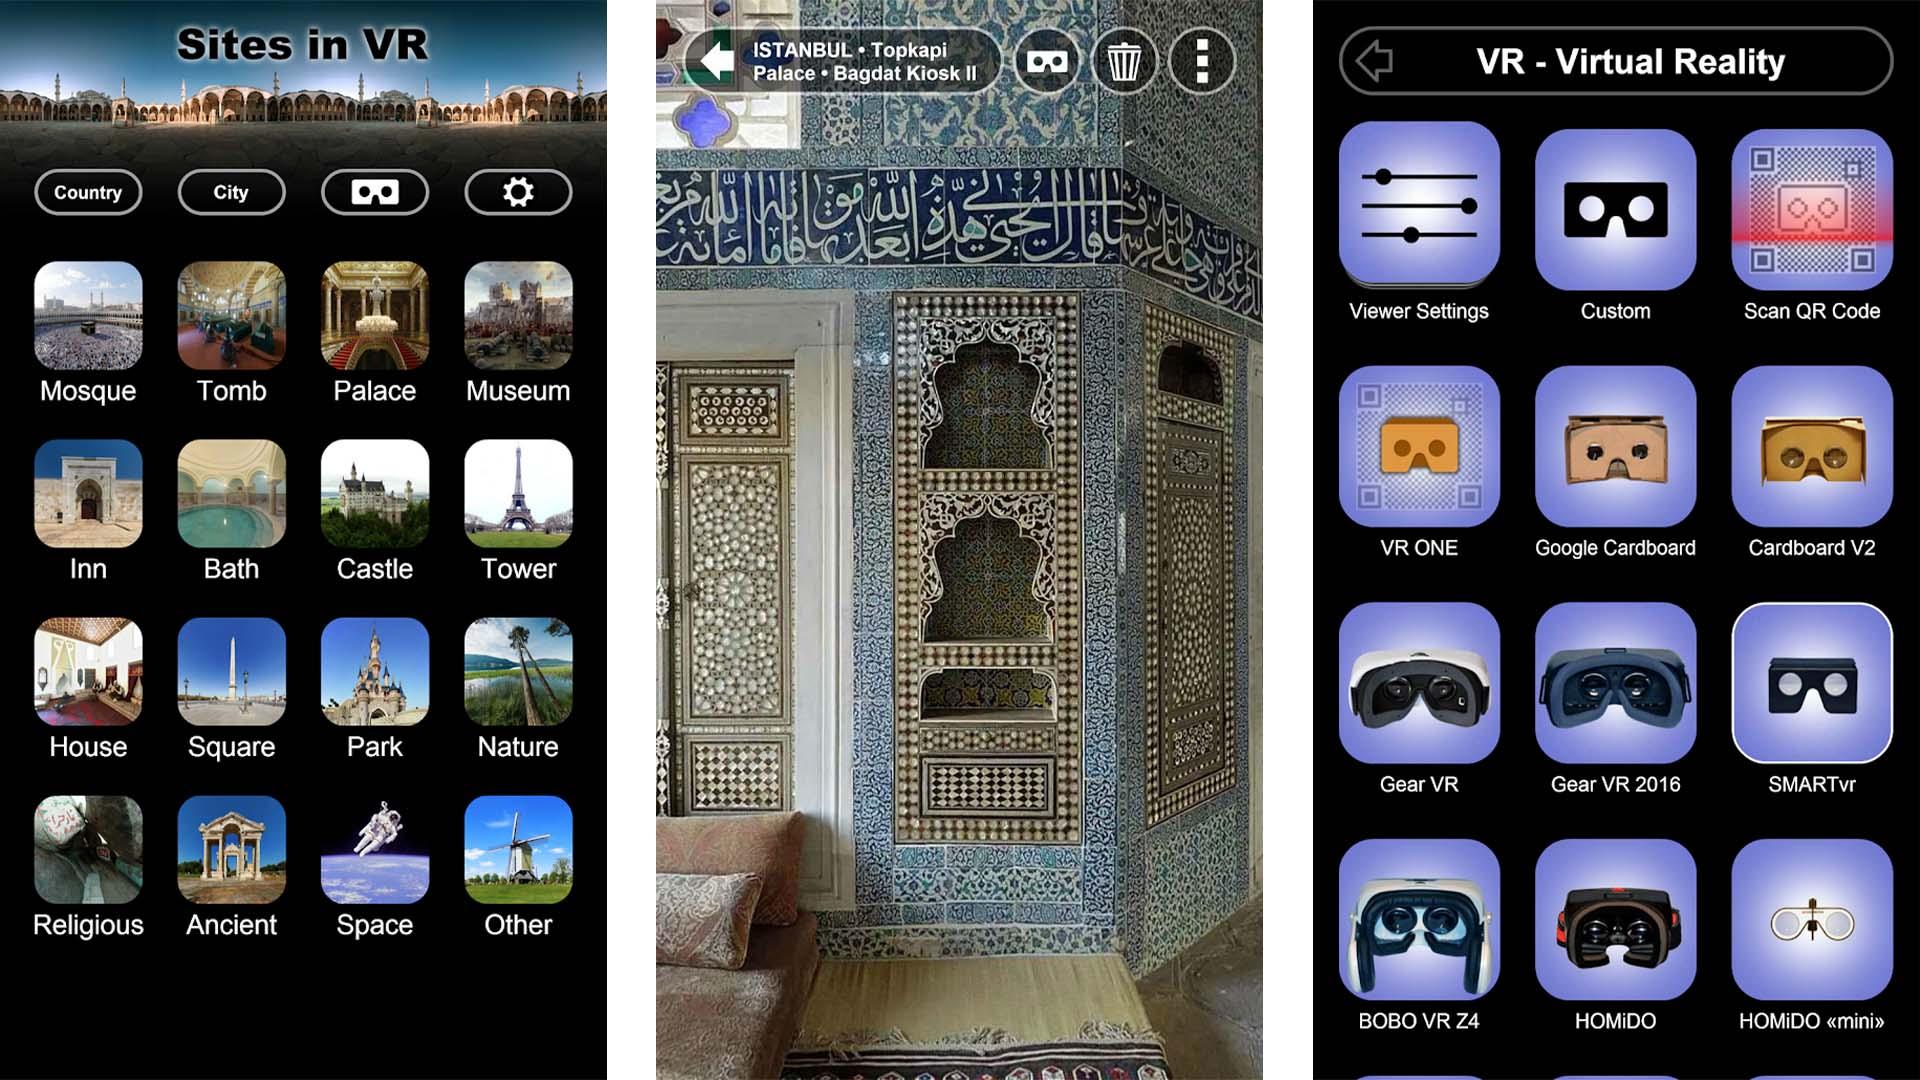 Sites in VR screenshot